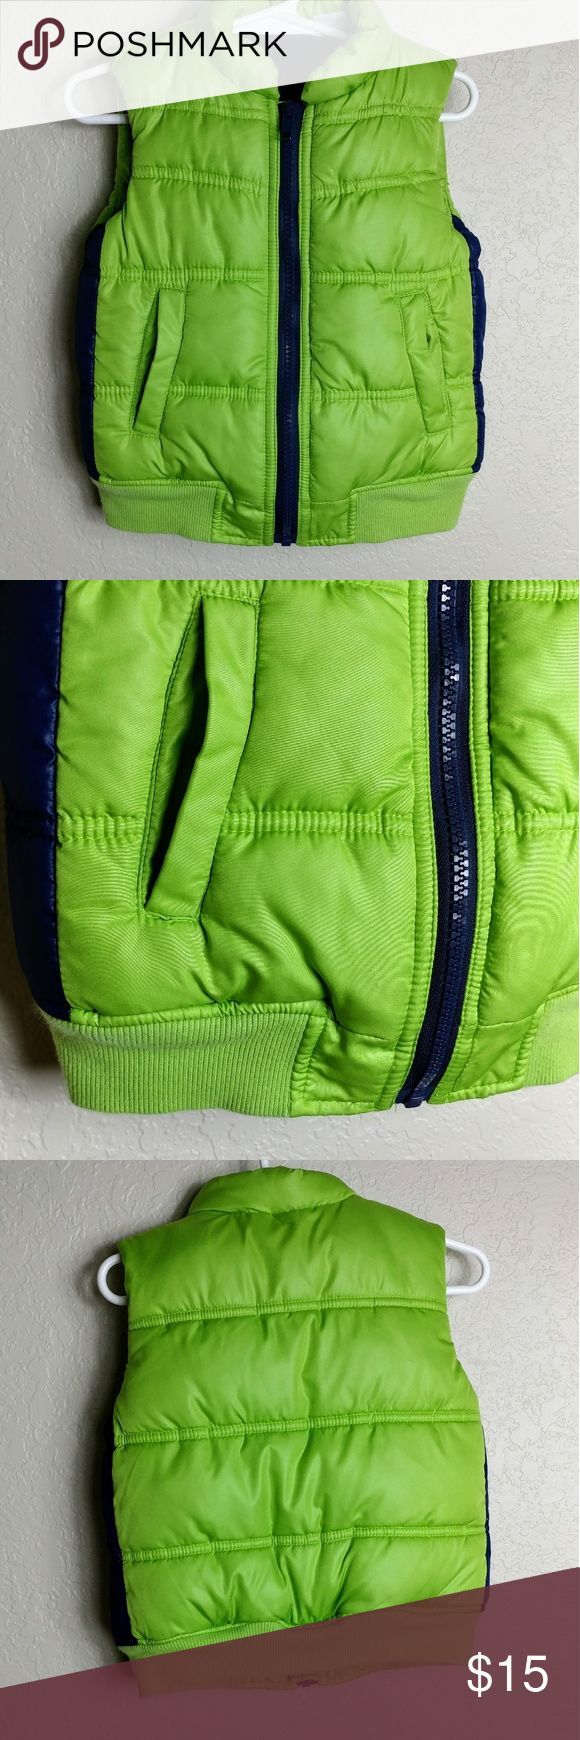 "Kids R Us Boys Winter Vest Lime Green Boys Winter Vest  Size 2  100% Polyester  Pit to Pit 11.5"" Length 14"" Kids R Us Jackets & Coats Vests"